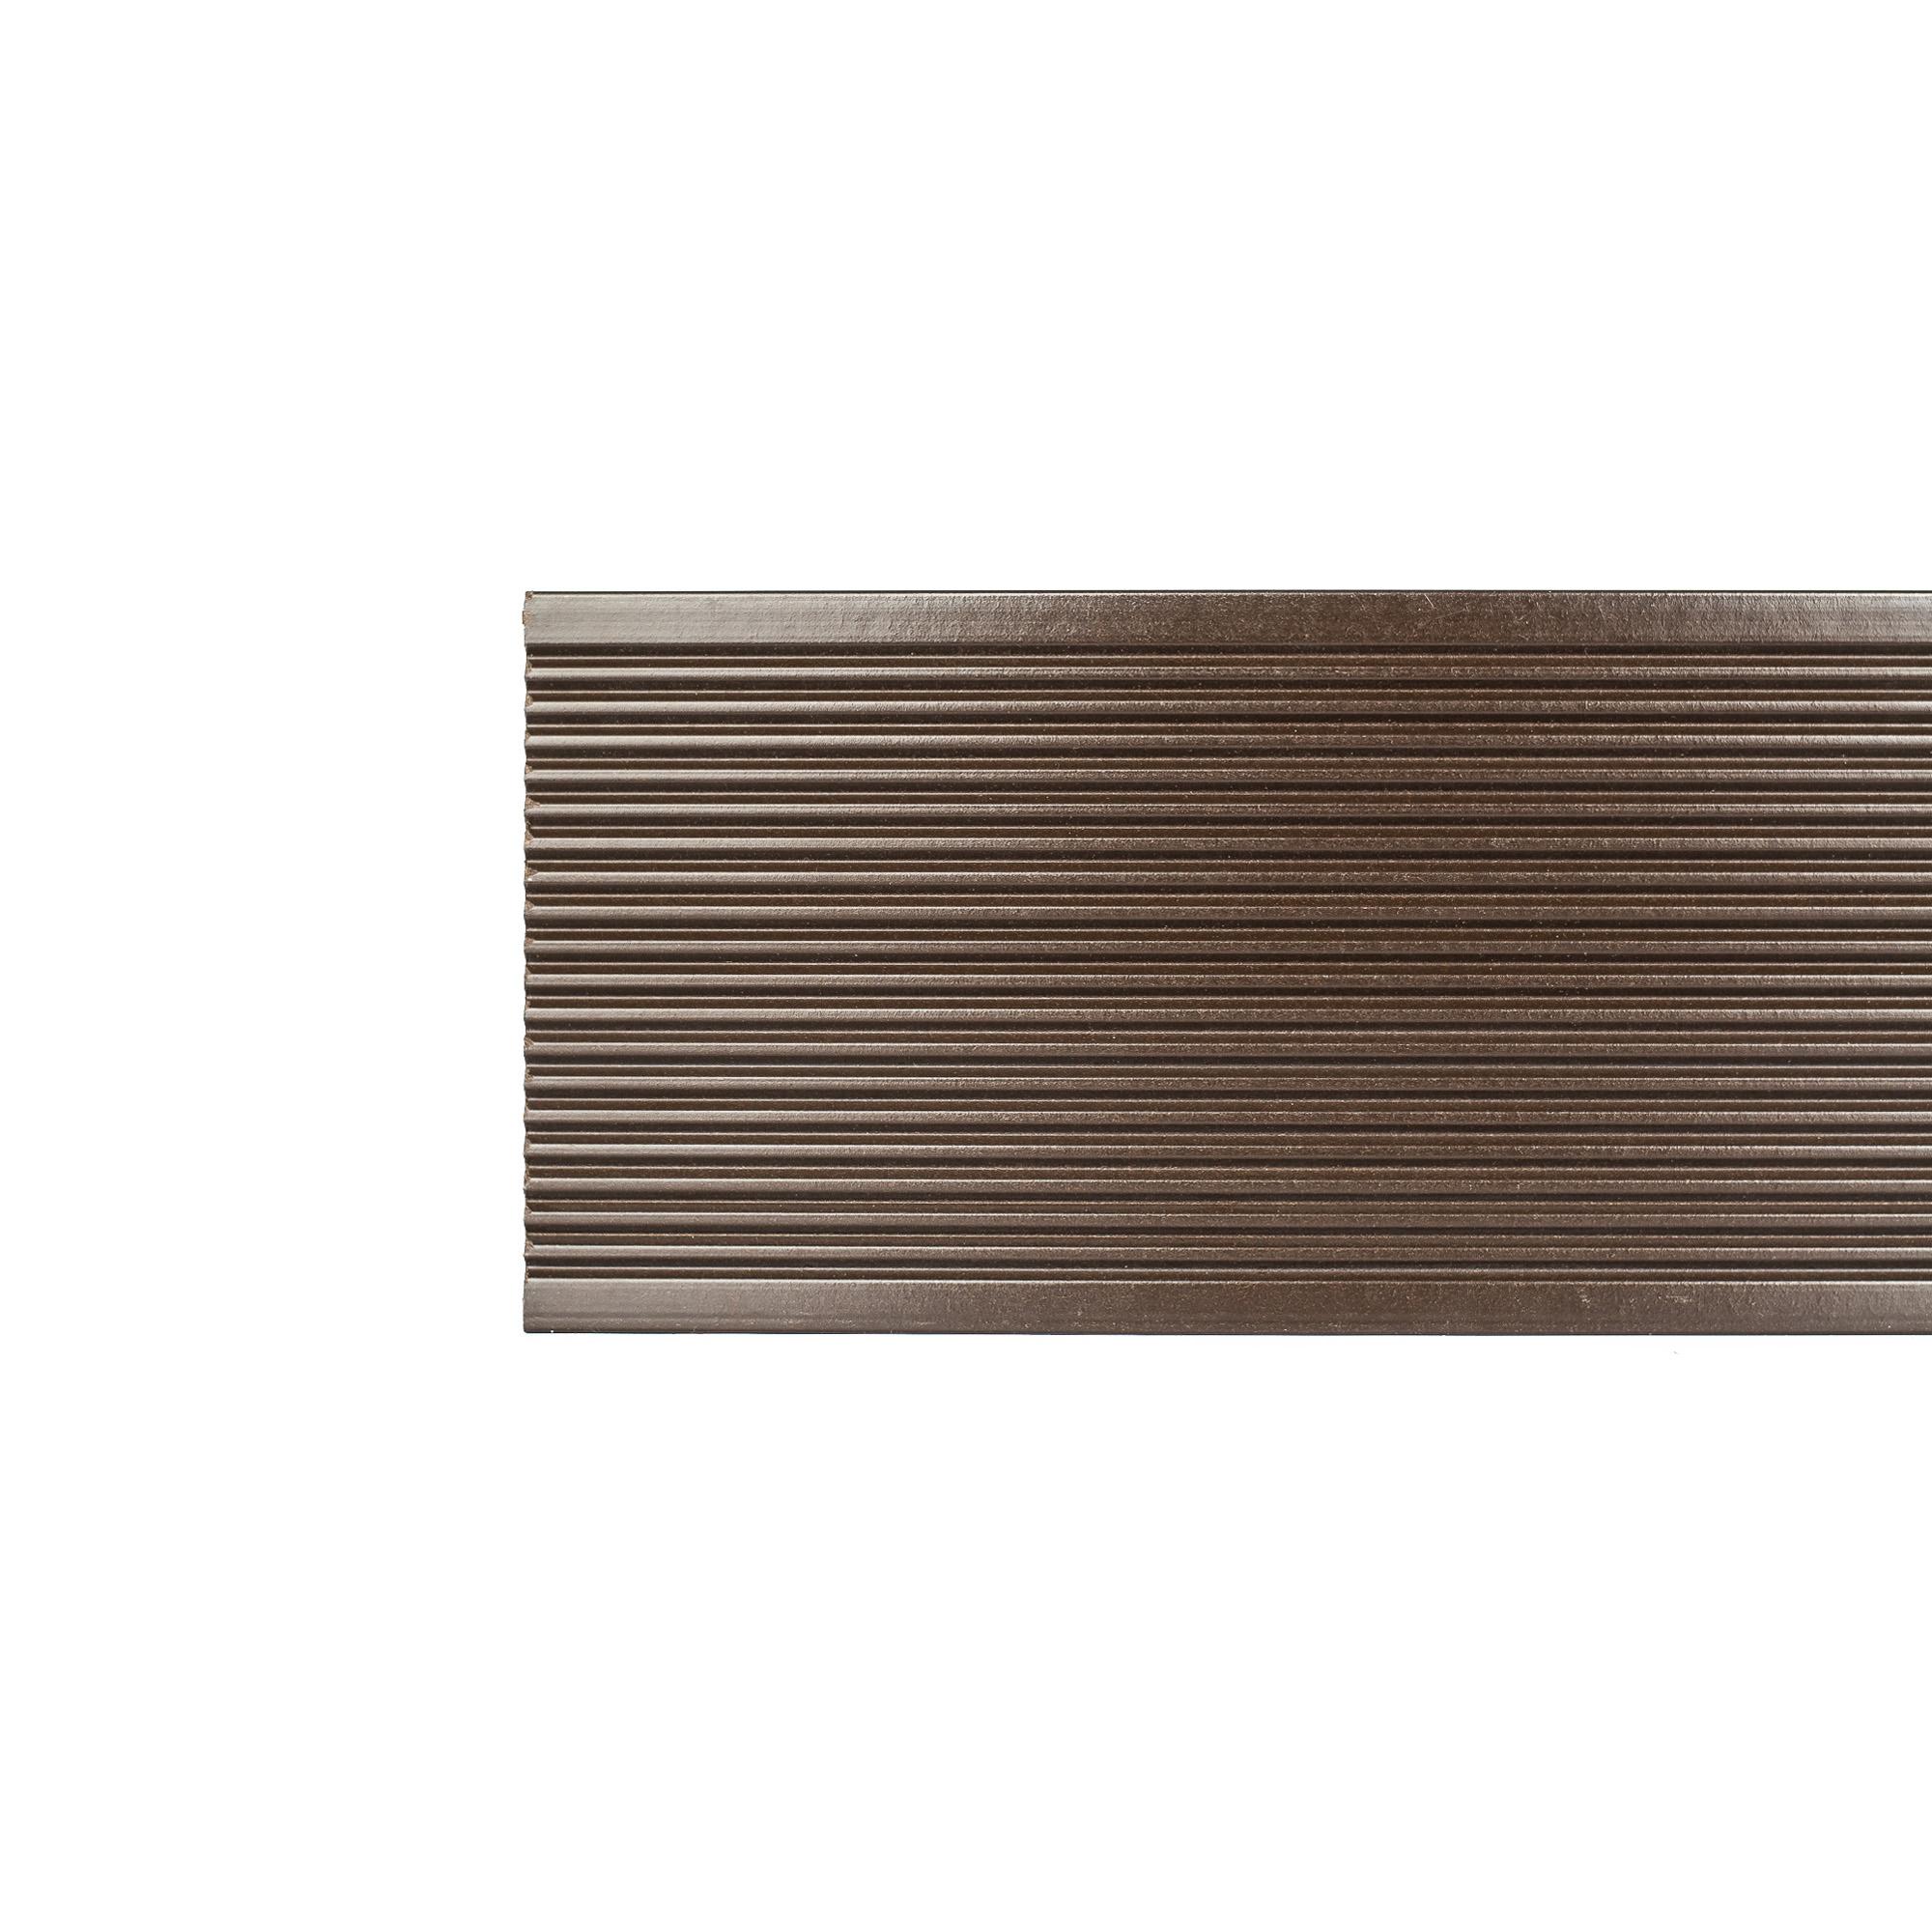 Profil gard WPC, wenge, 24 x 120 x 2000 mm imagine MatHaus